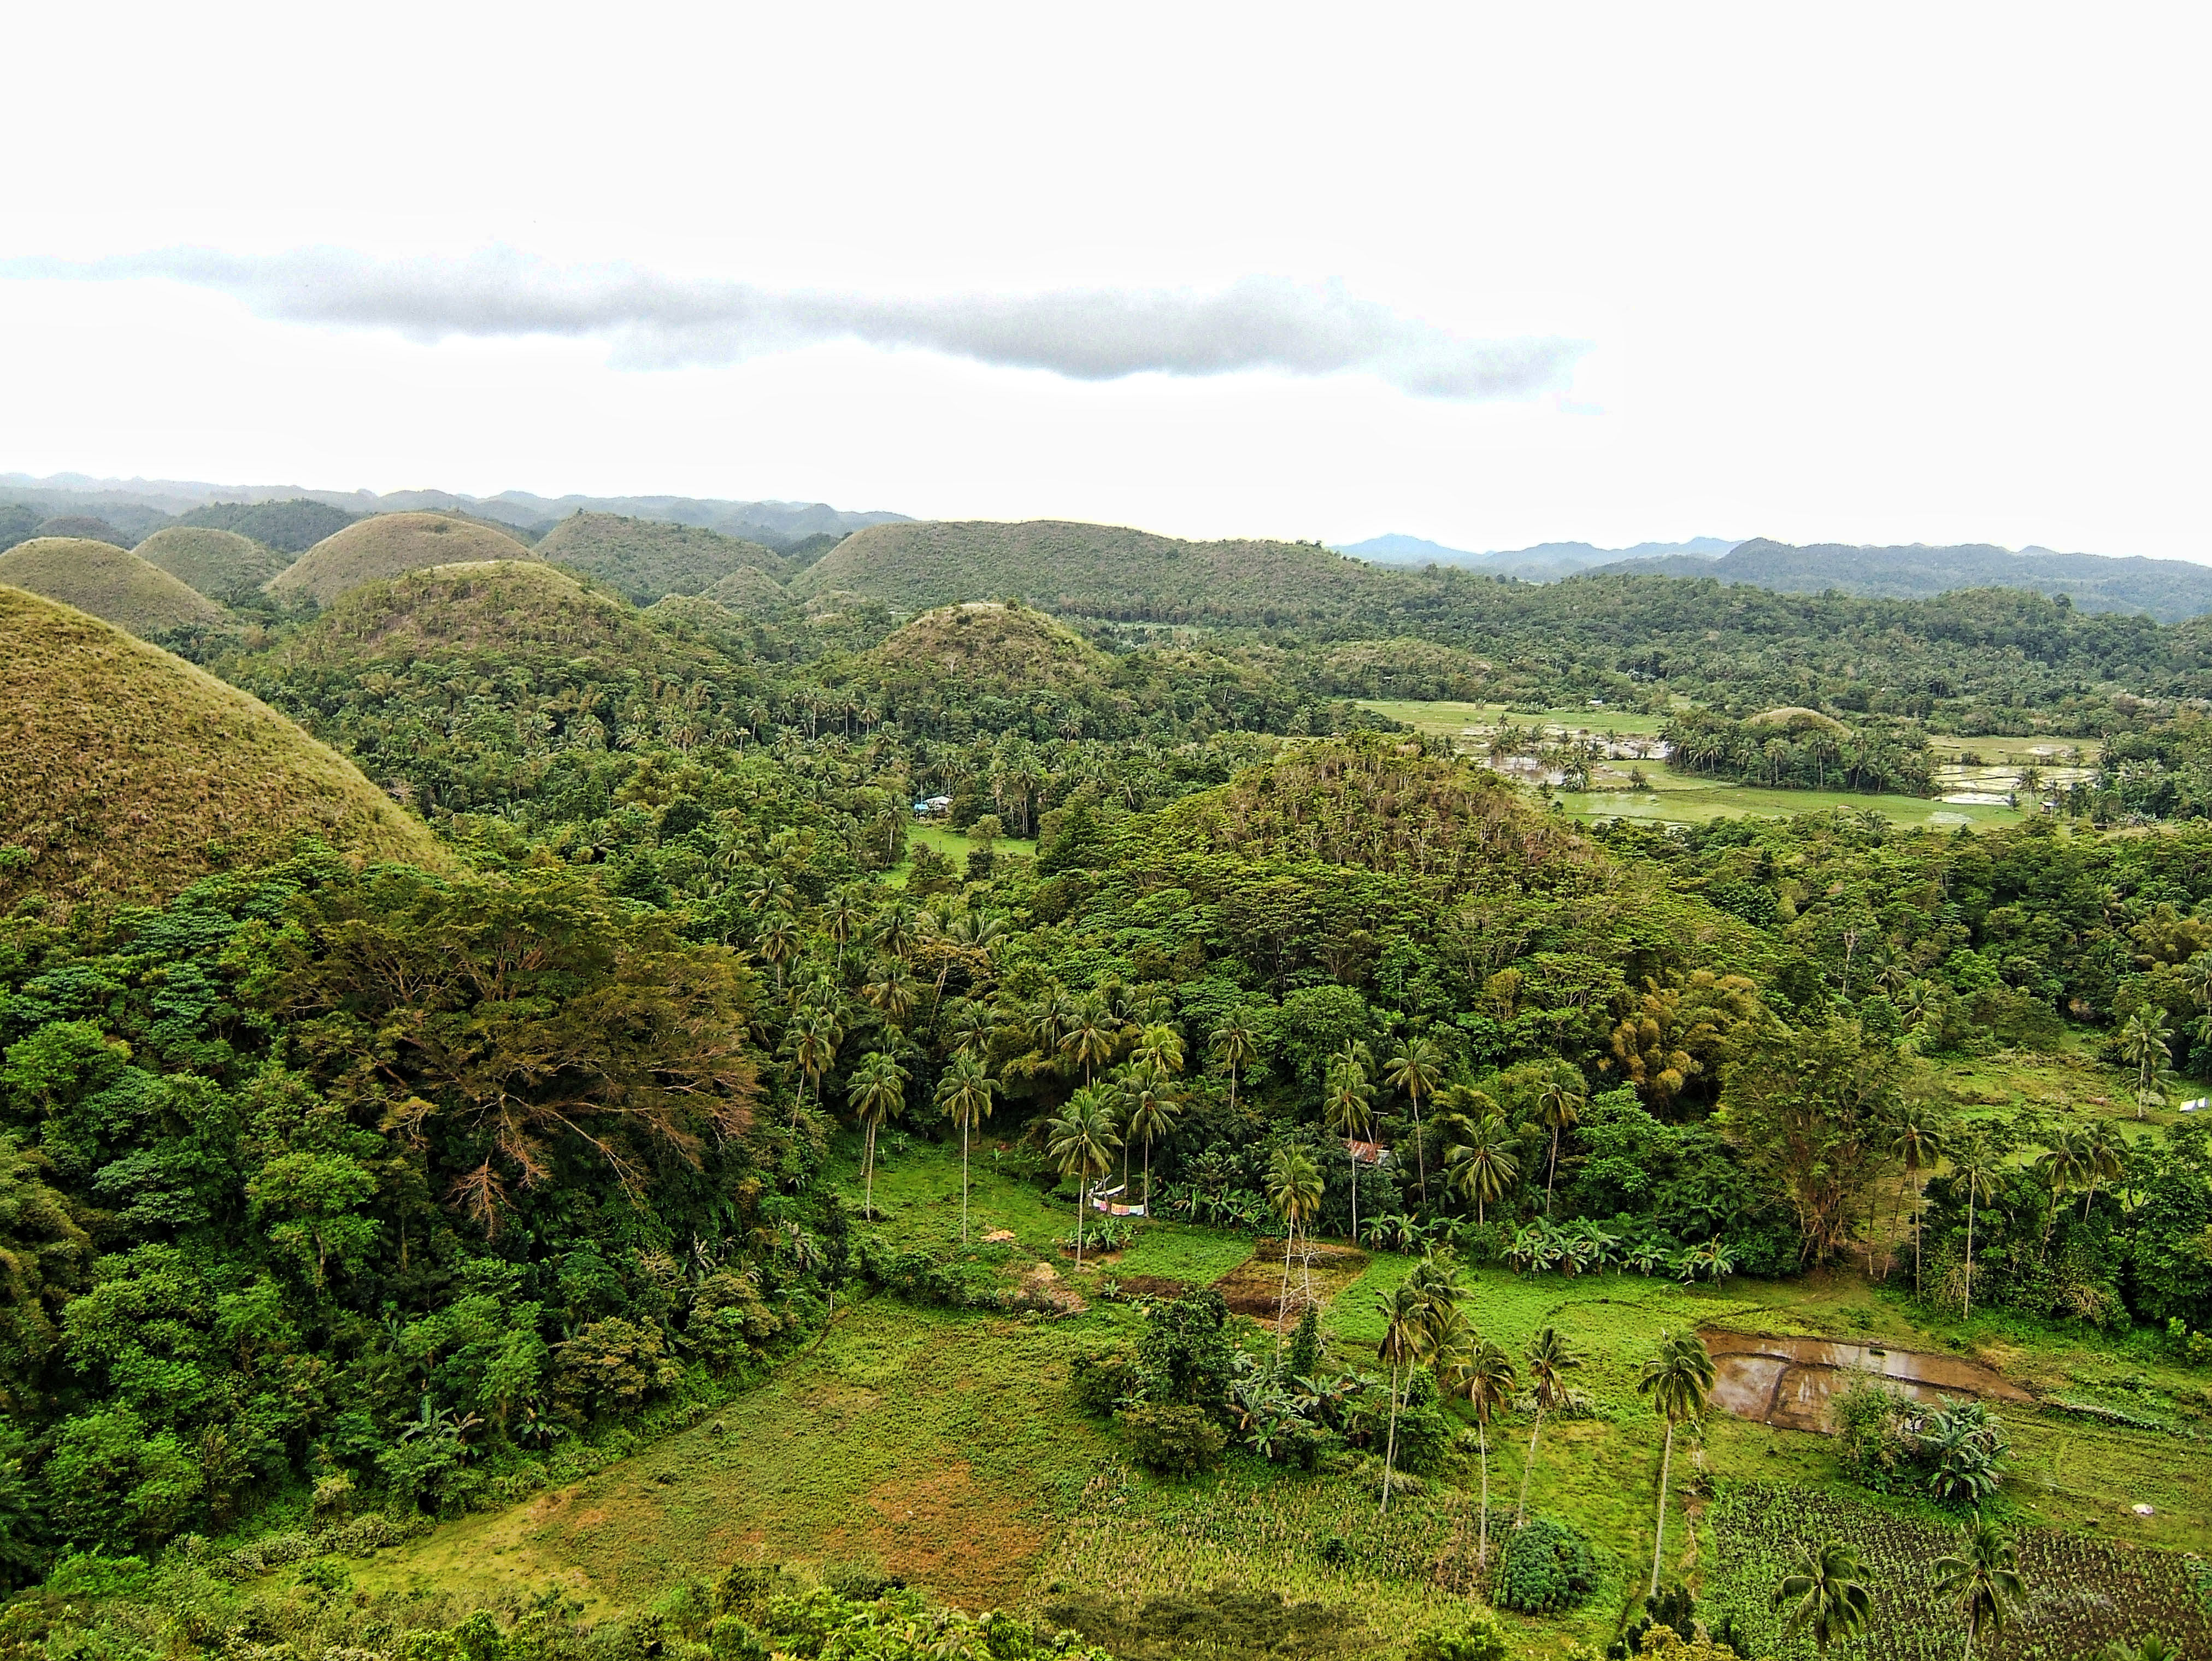 Philippines Sagbayan Batuan Carmen Bohol Chocolate Hills Dec 2005 09